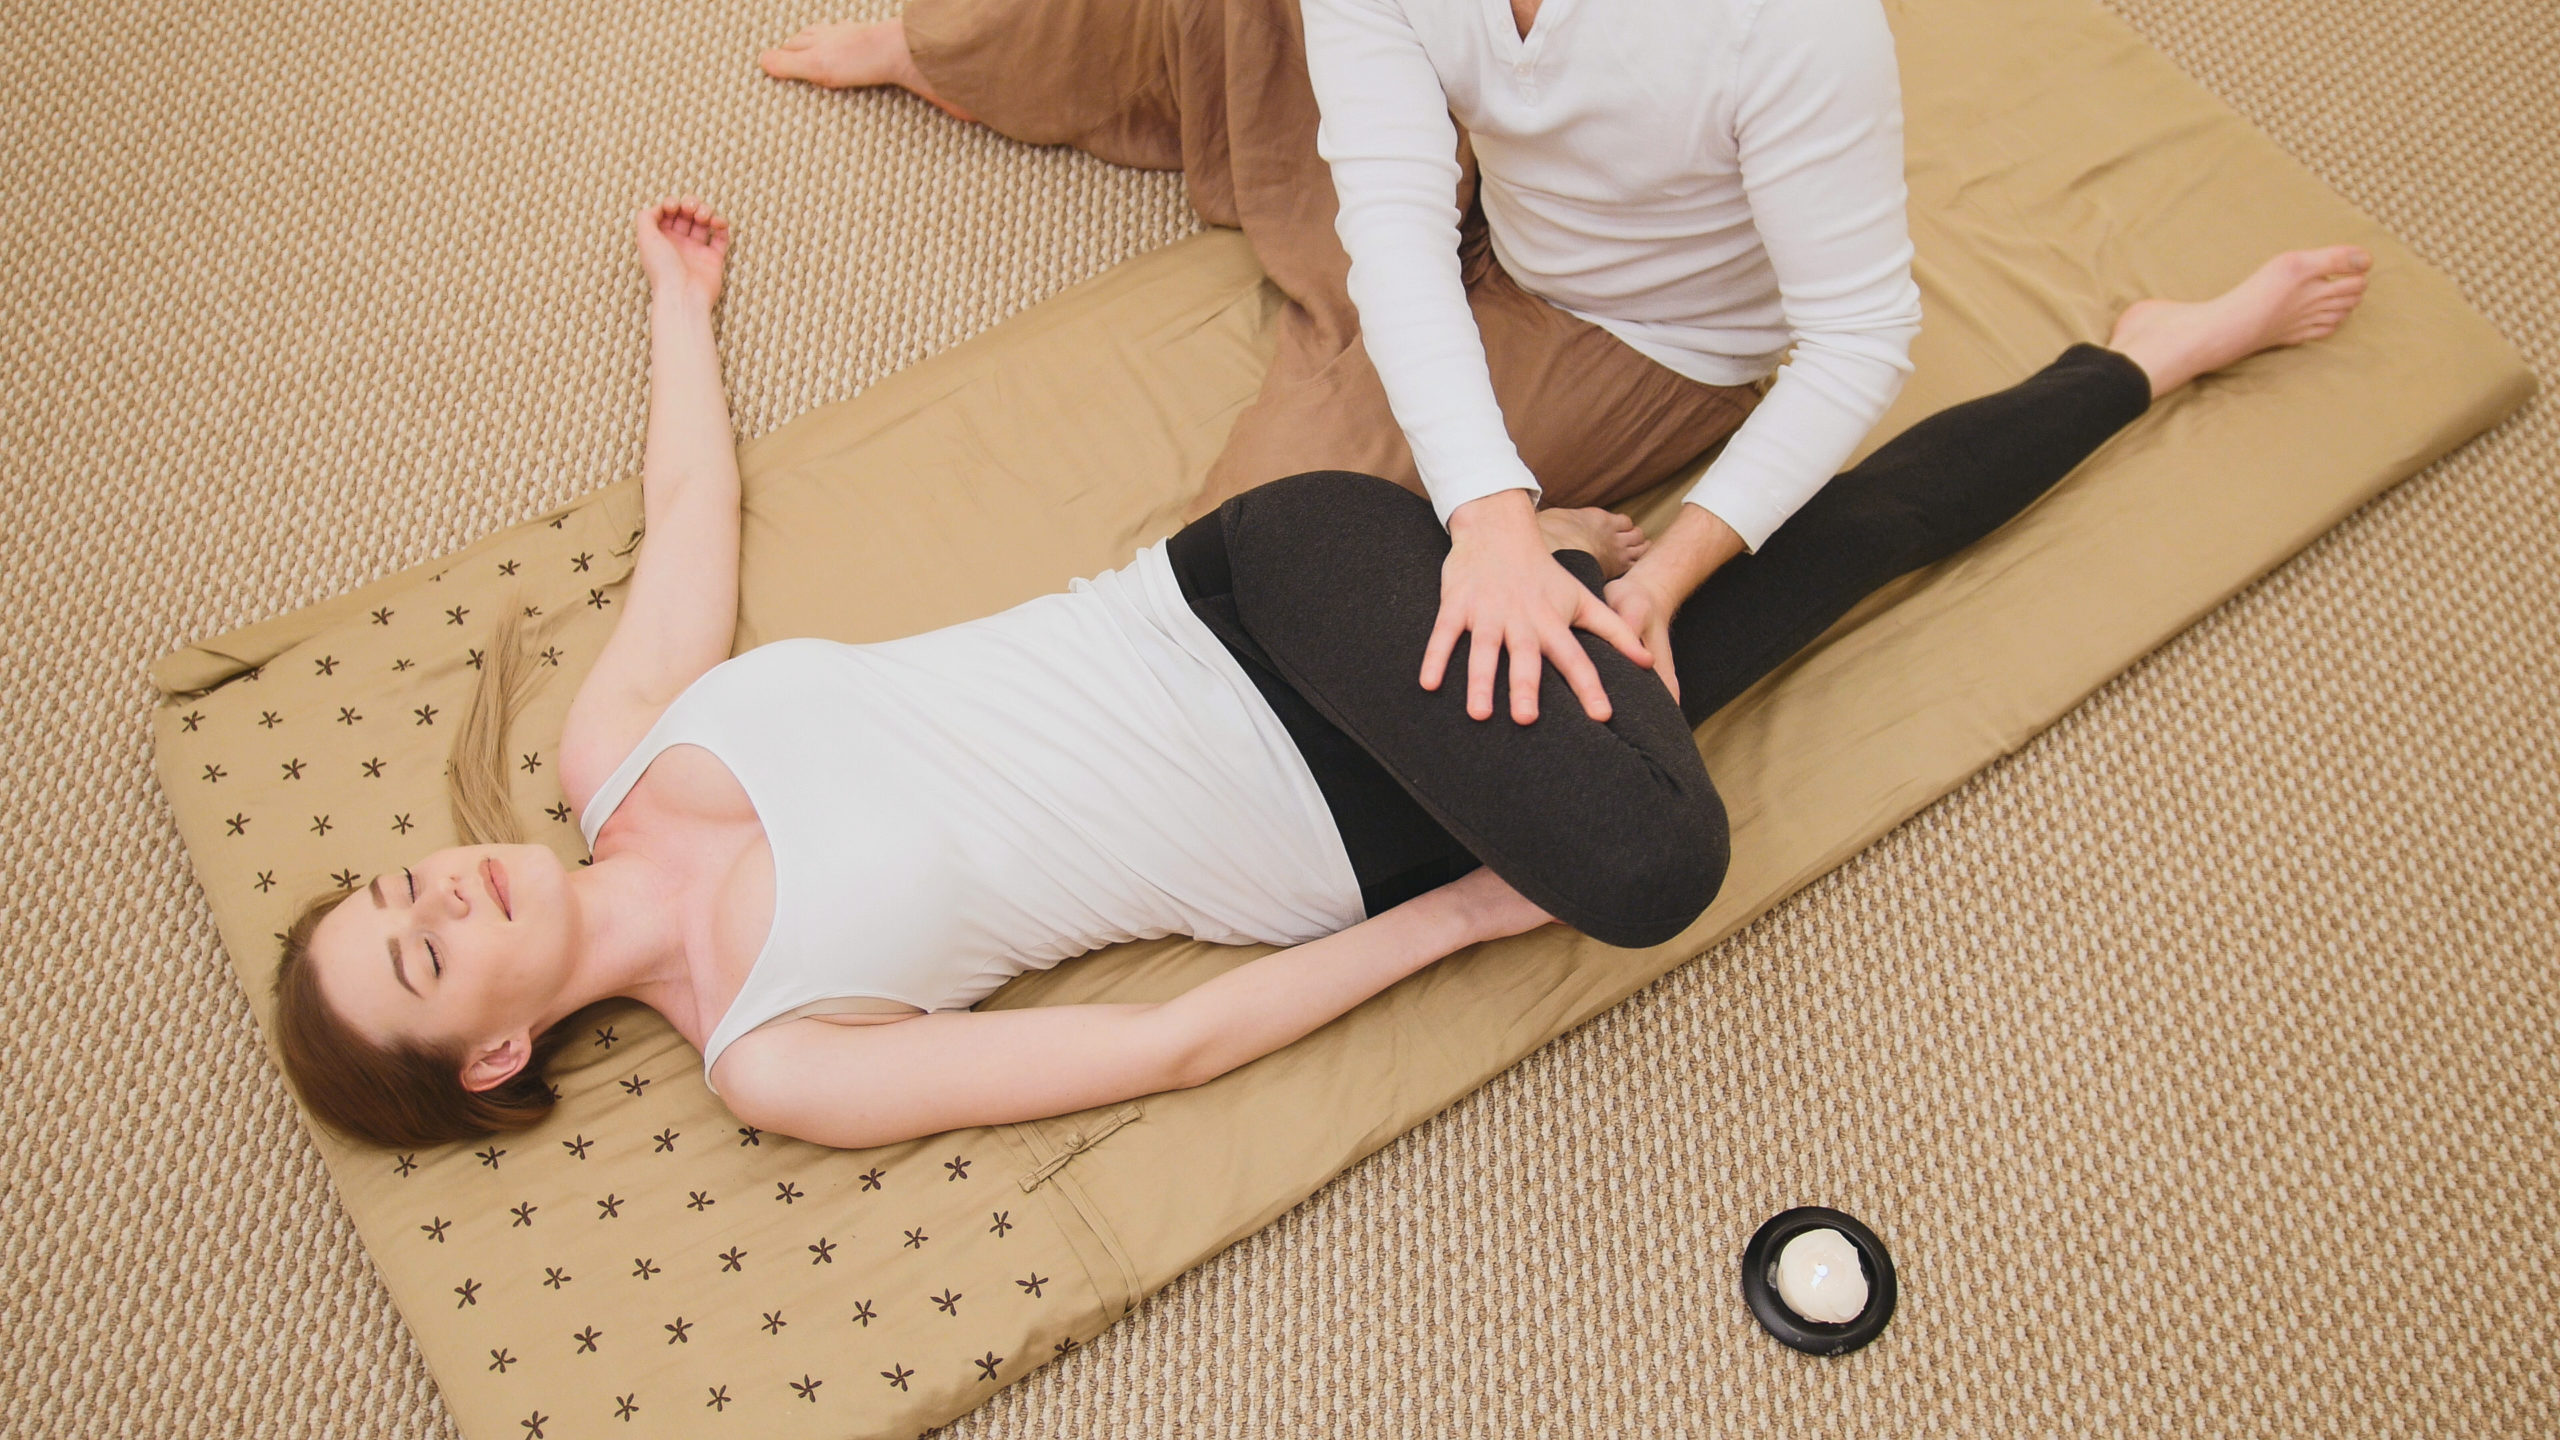 Personal Yoga/ Yogatherapie, auch online! 60 min 55€, 75min 65€, 90min 75€